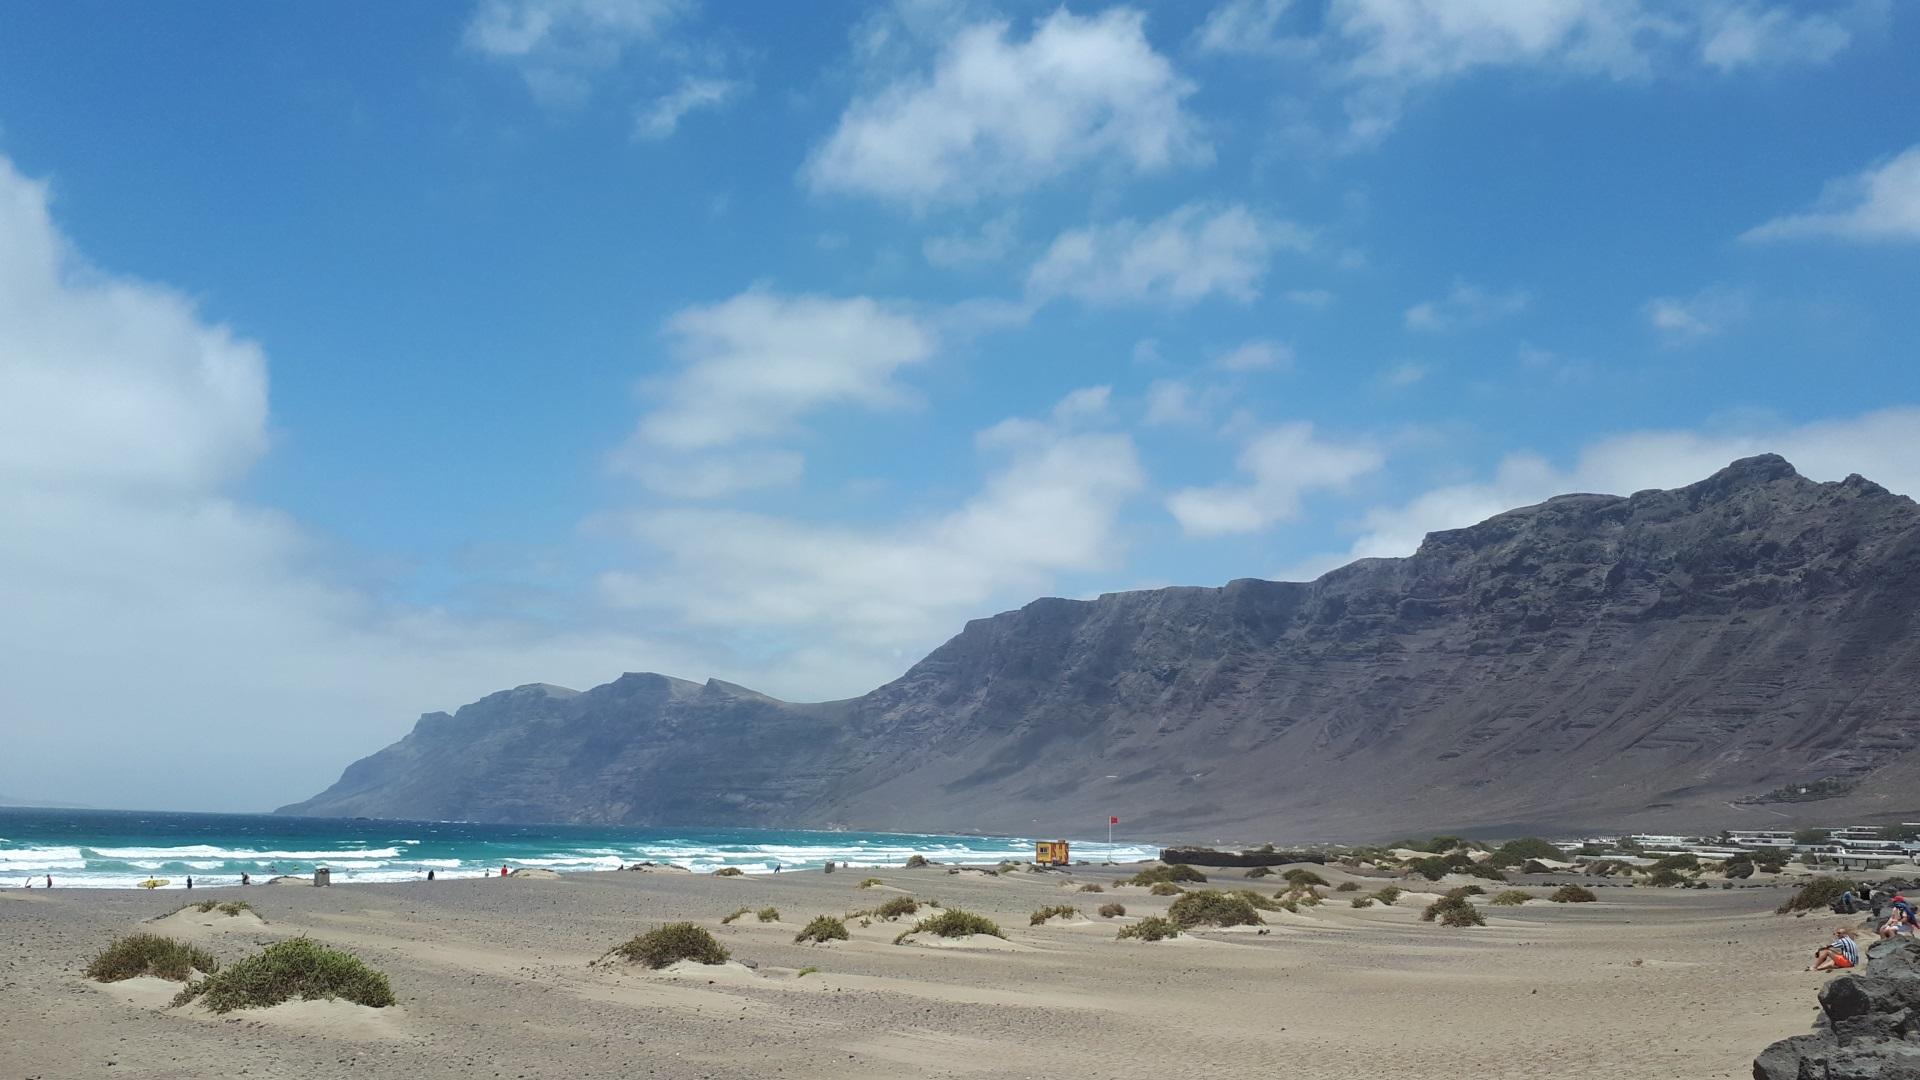 Visiter Les falaises de Famara (Lanzarote) - Canaries